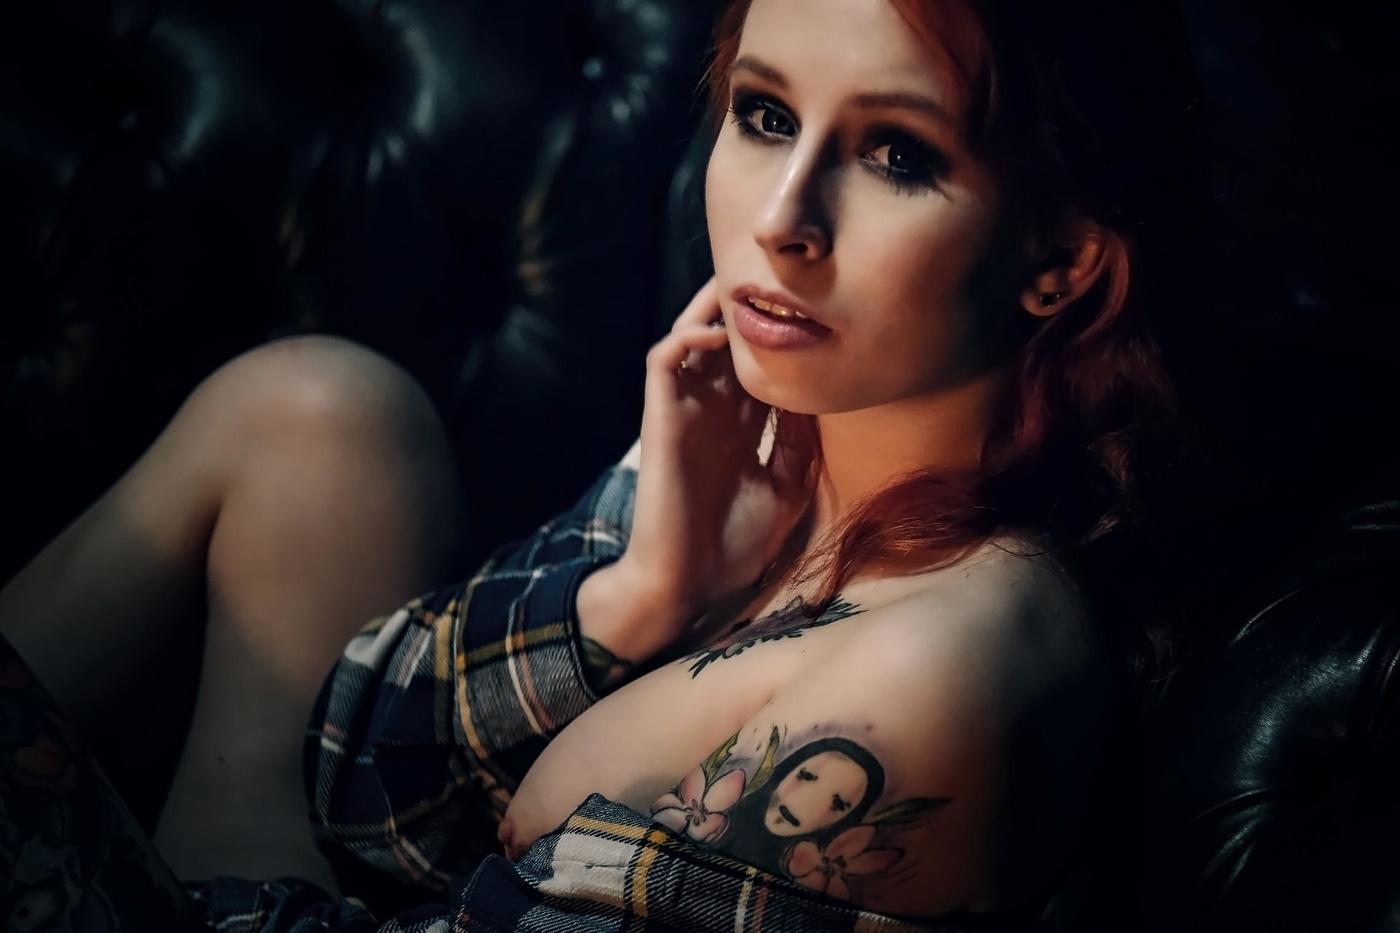 Екатерина киселёва работа для девушек в каши